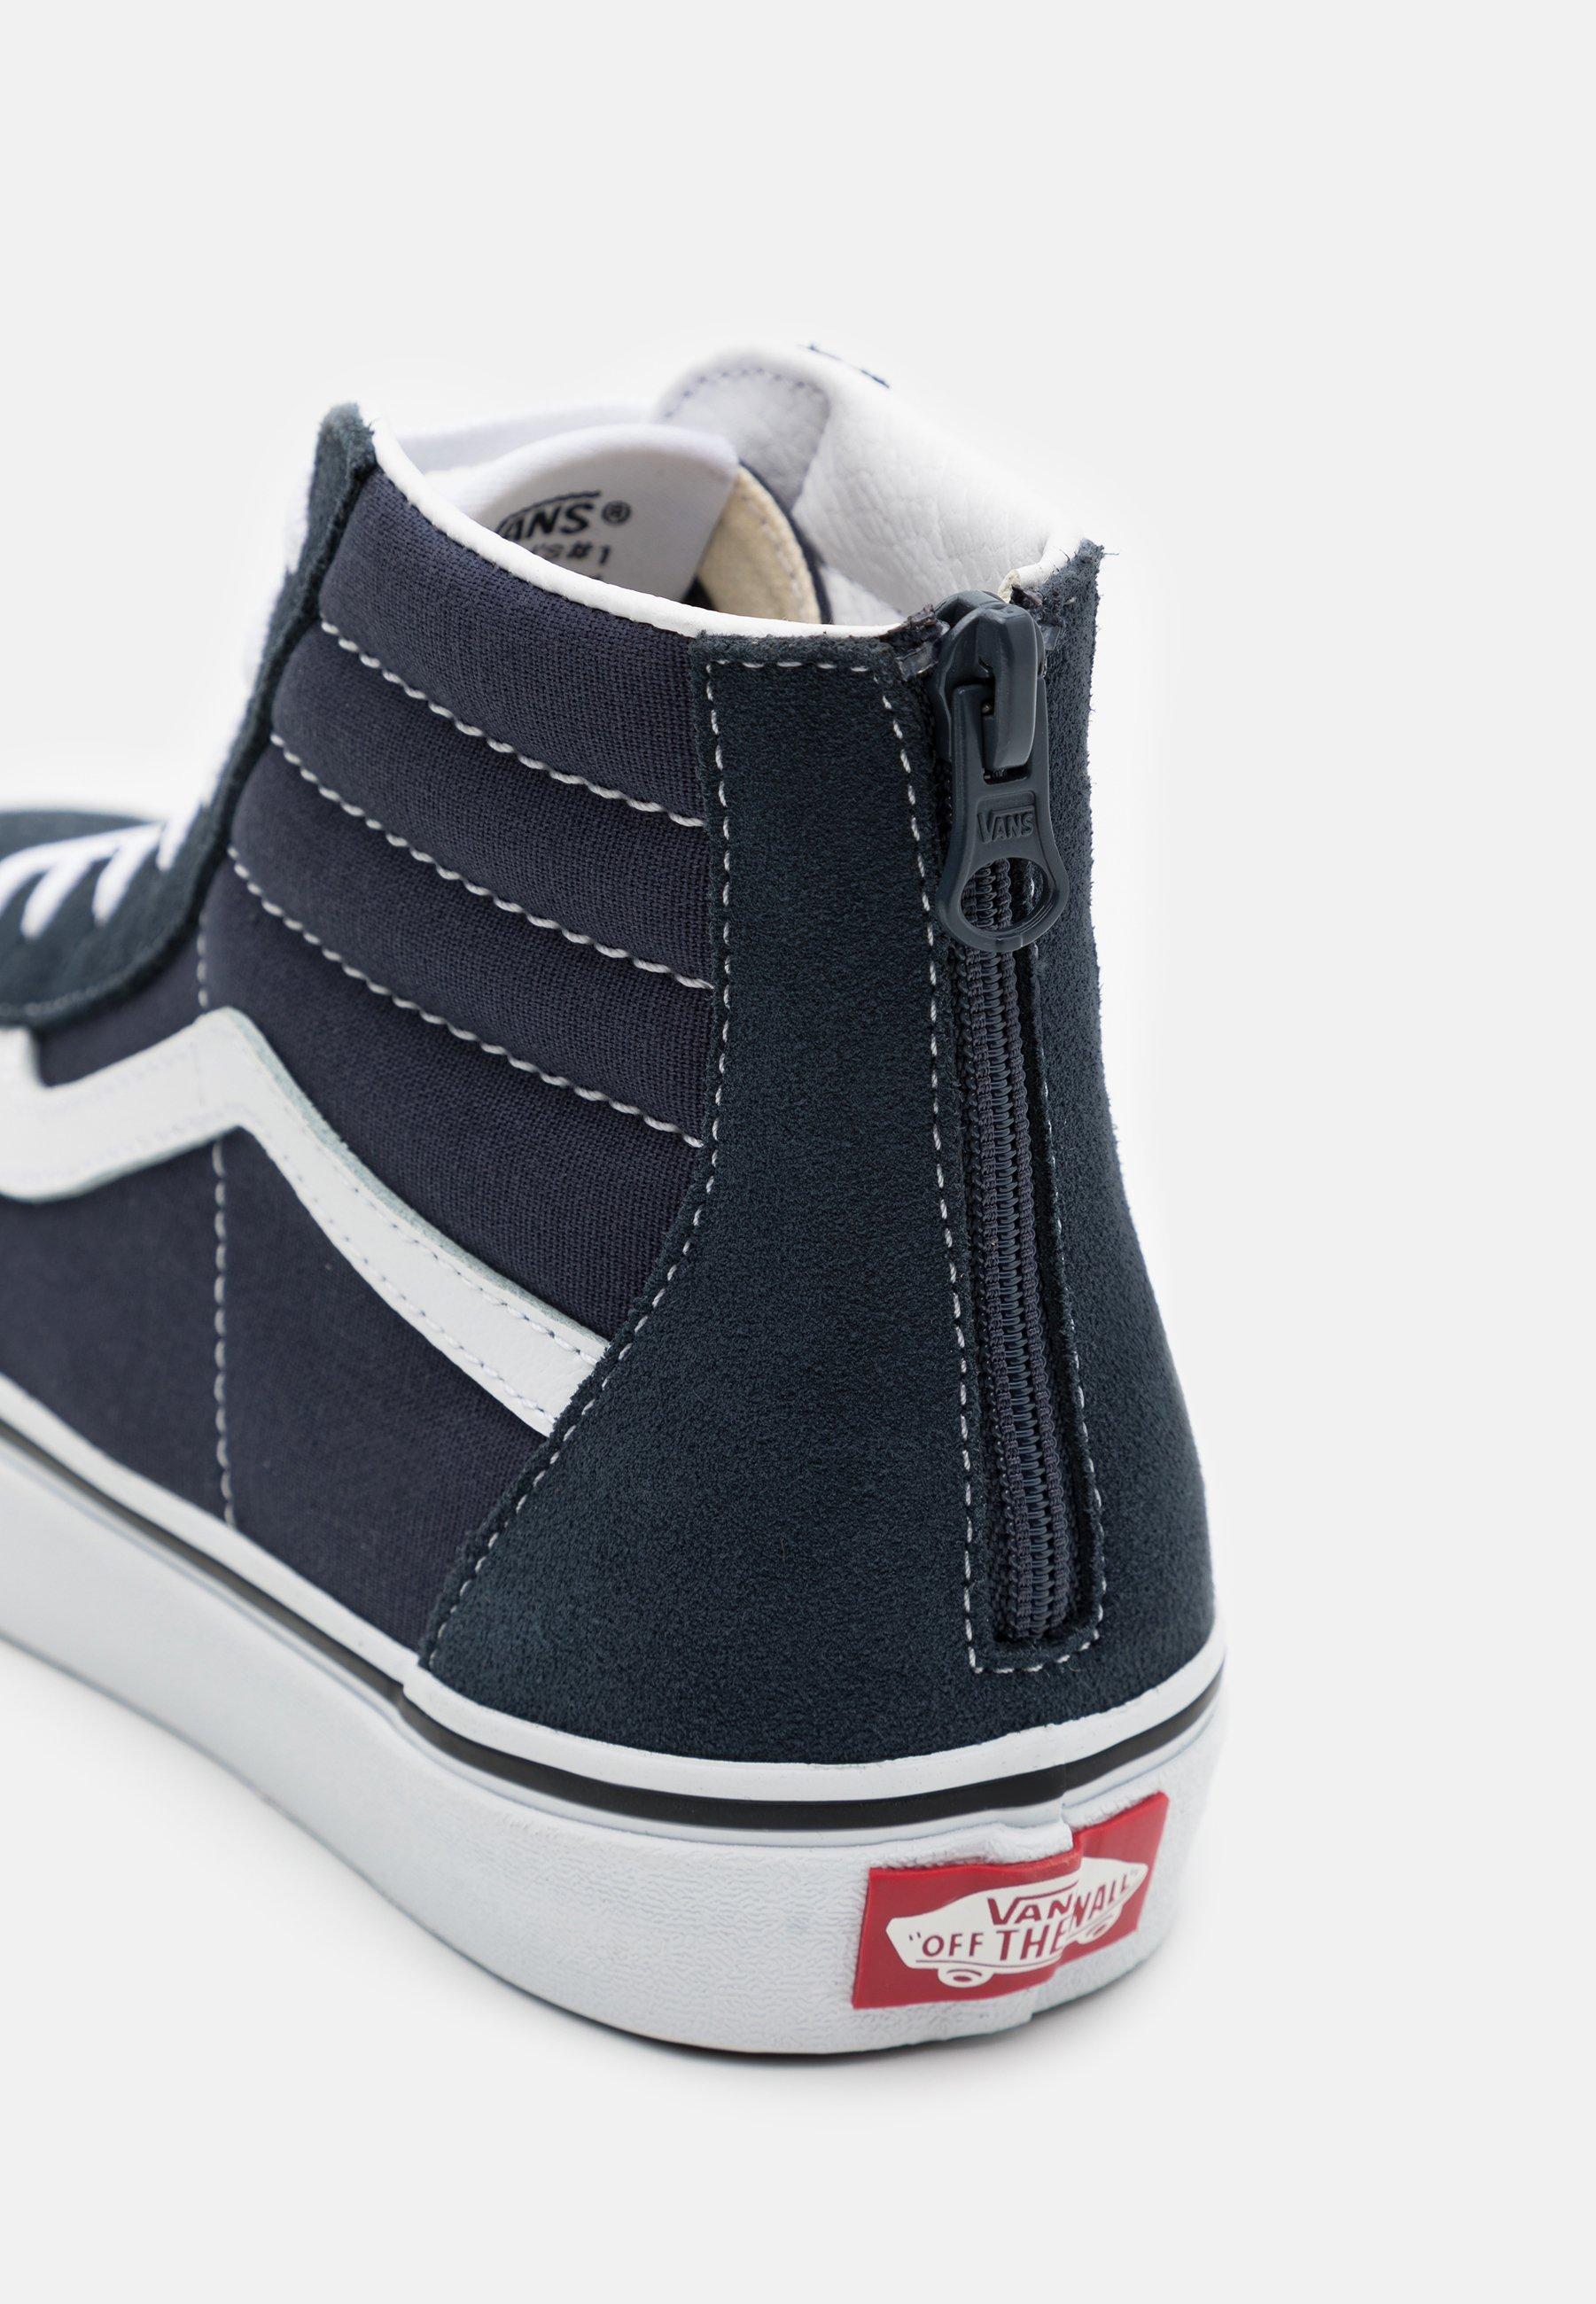 SK8 ZIP Sneakers hoog india inktrue white